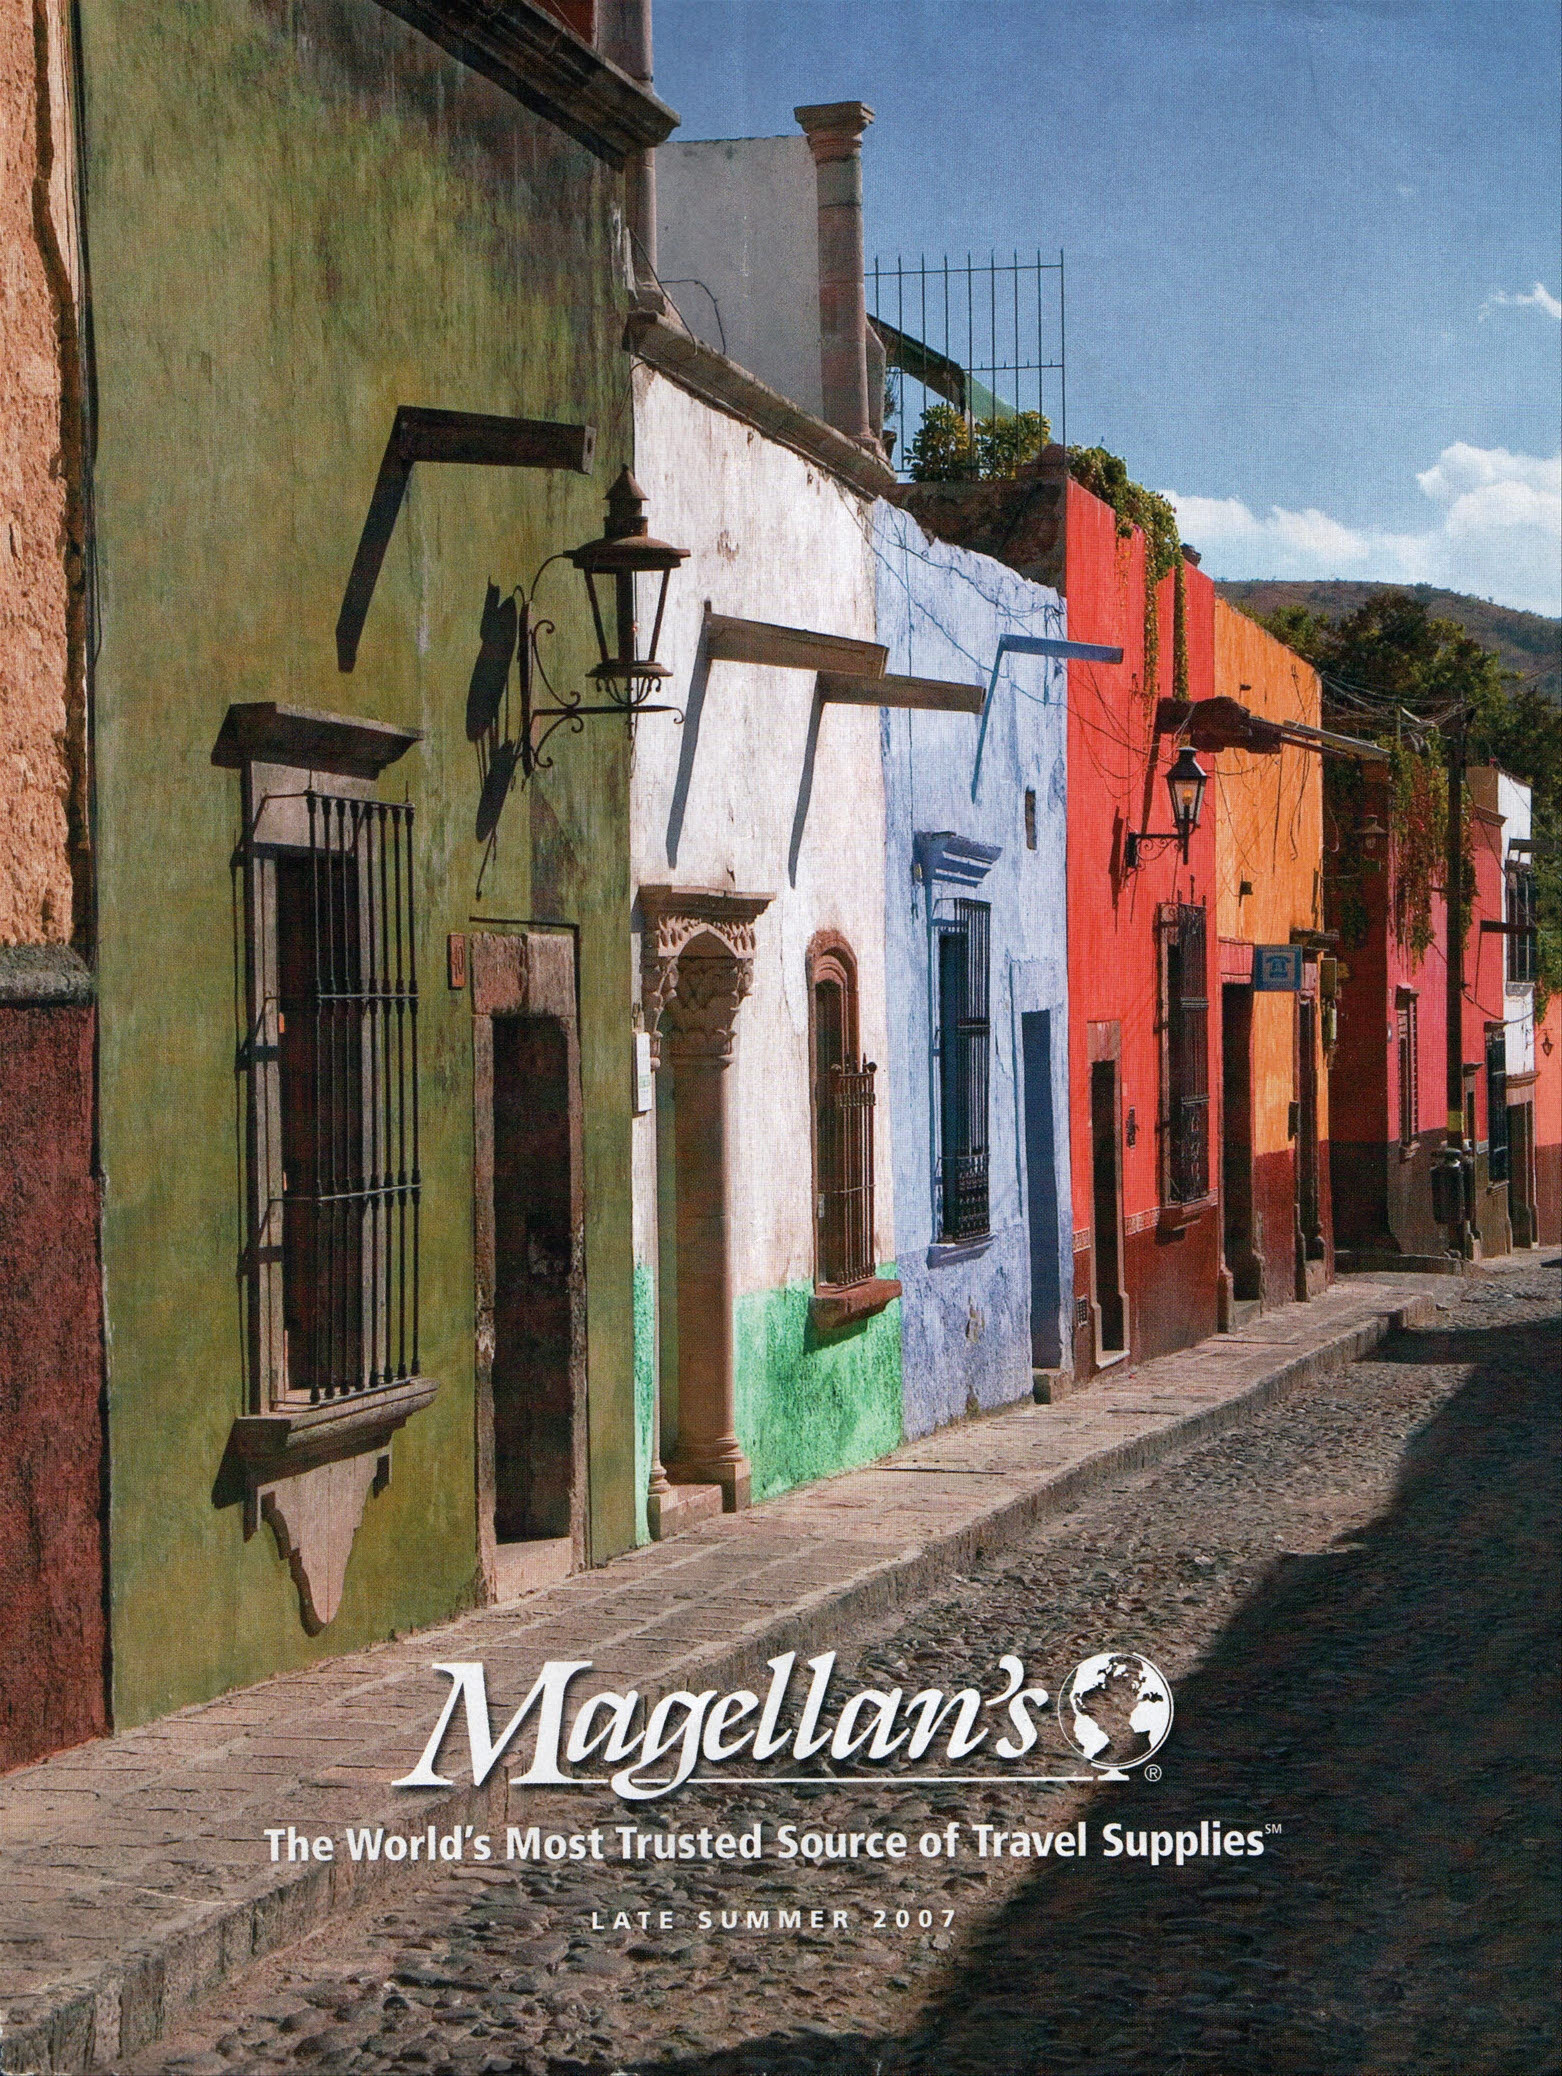 Cover of a Magellan's travel supplies catalog